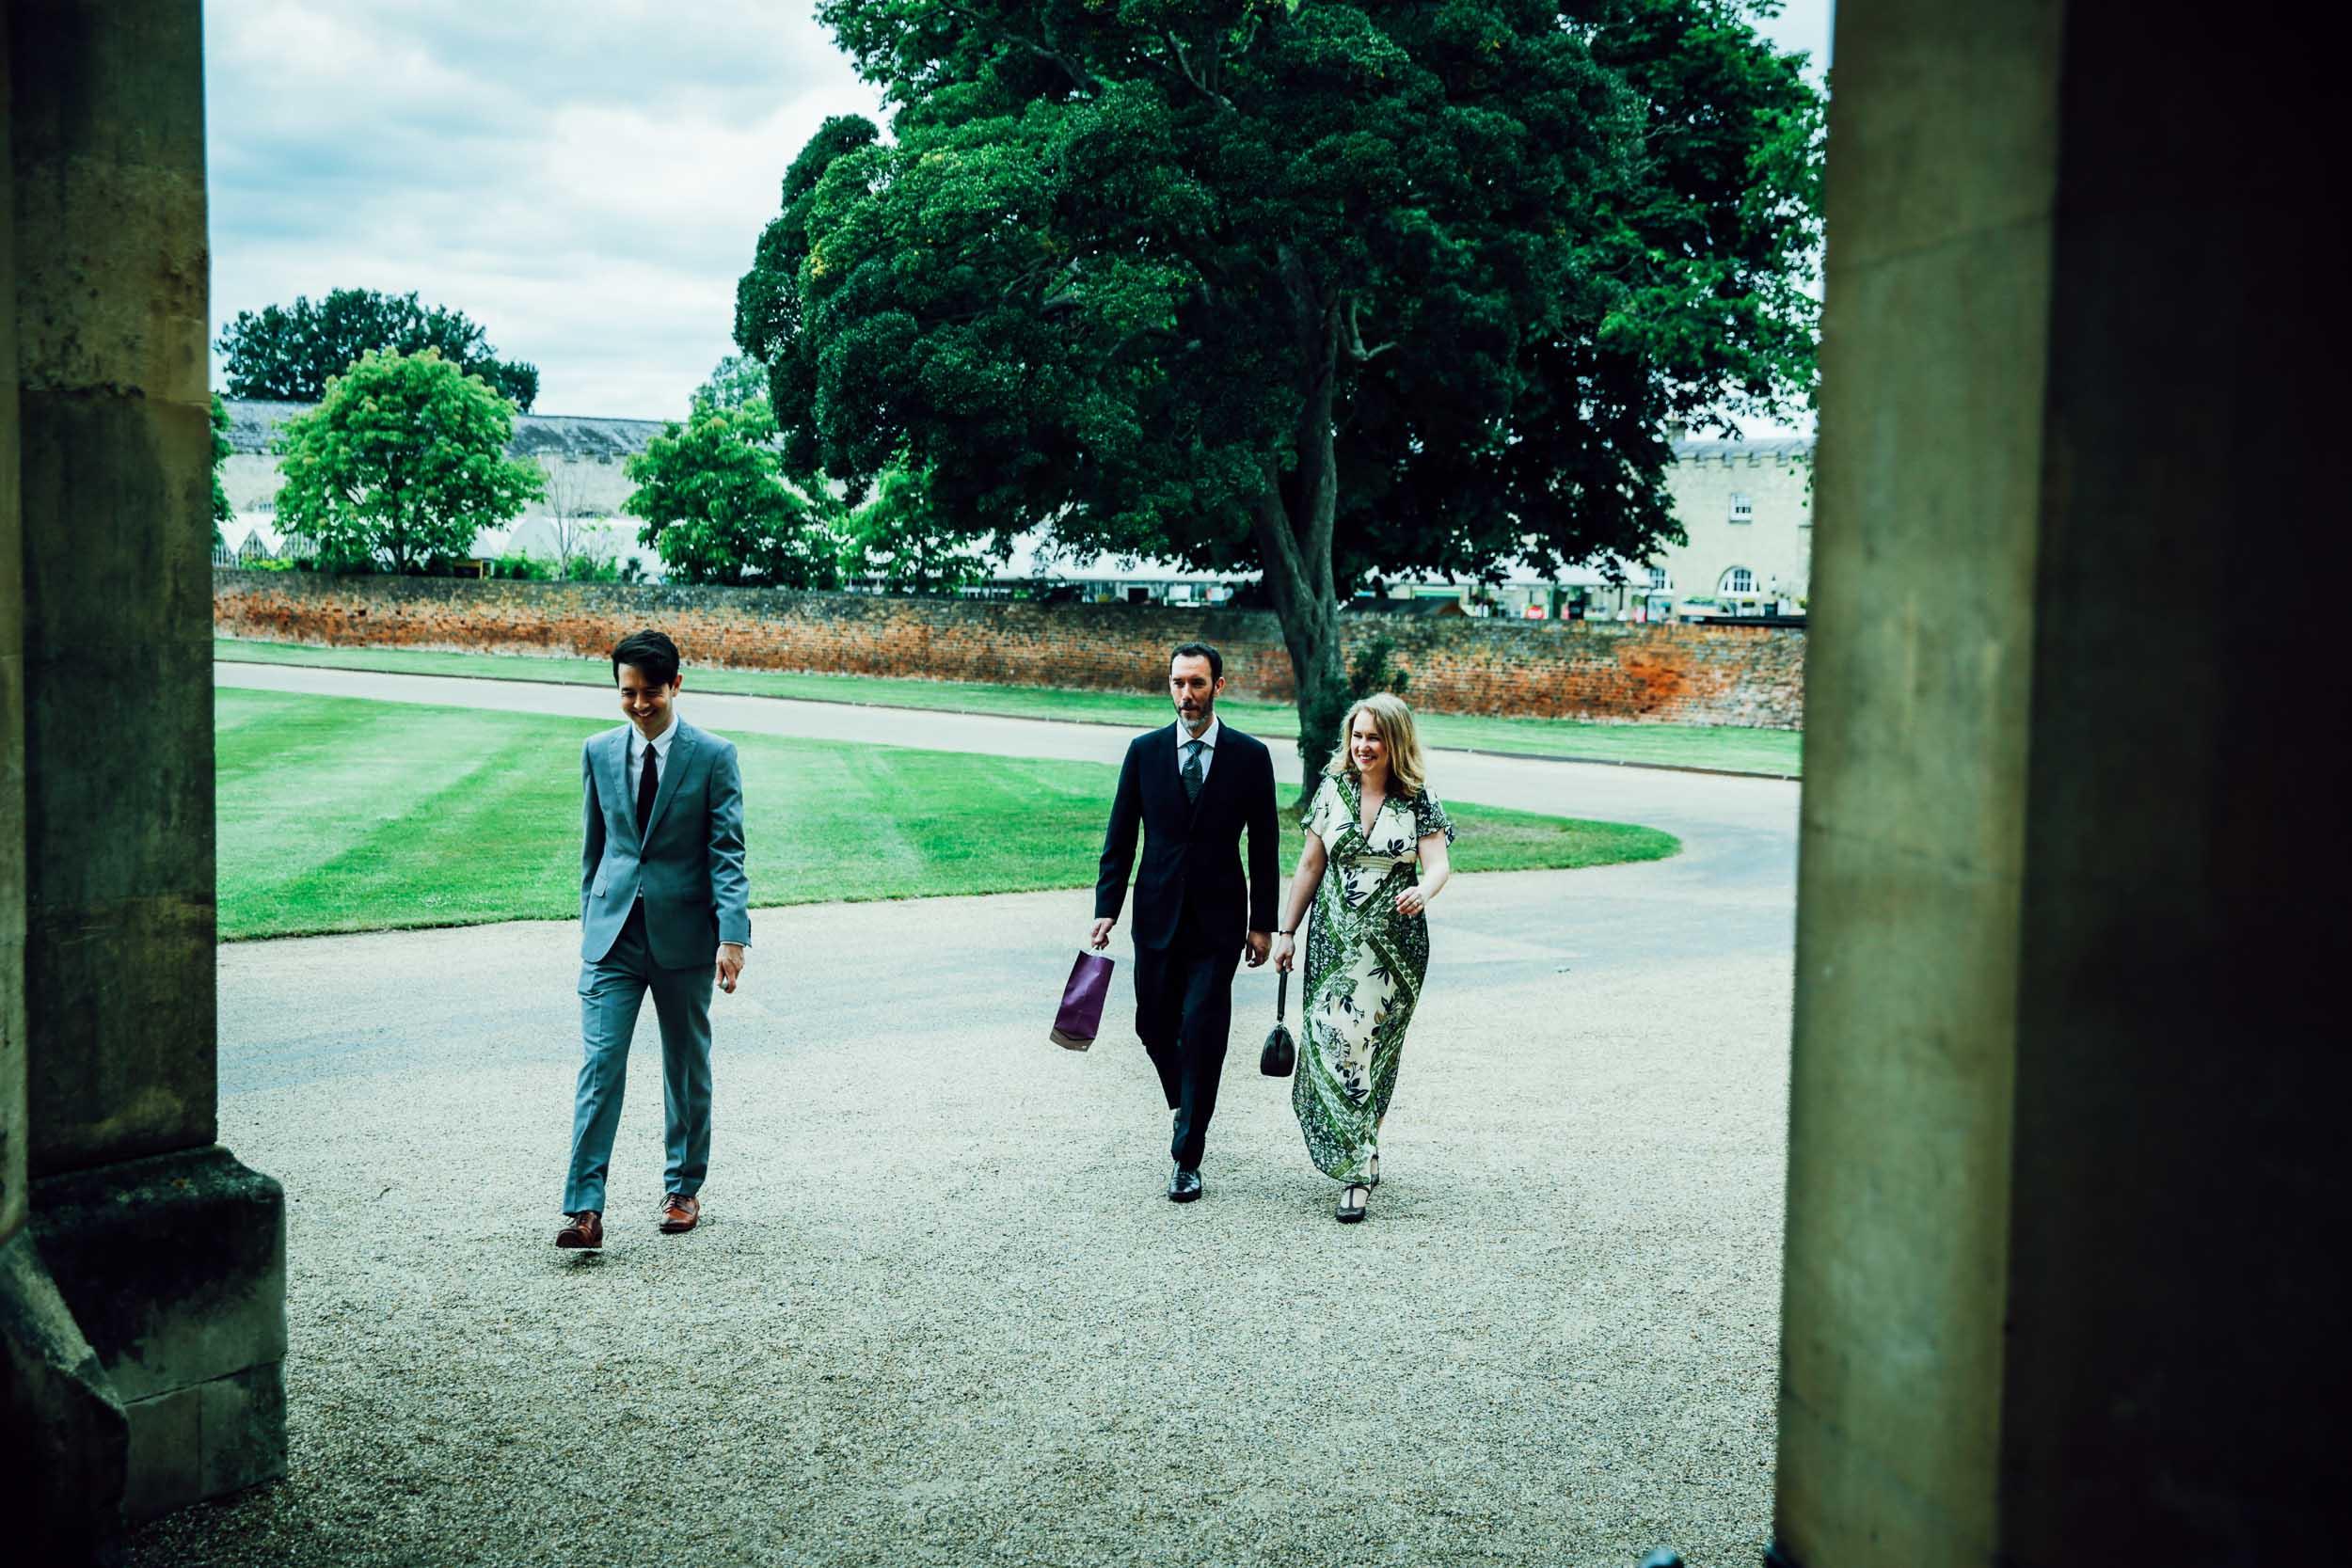 syon-house-wedding-photographer-london 032.jpg